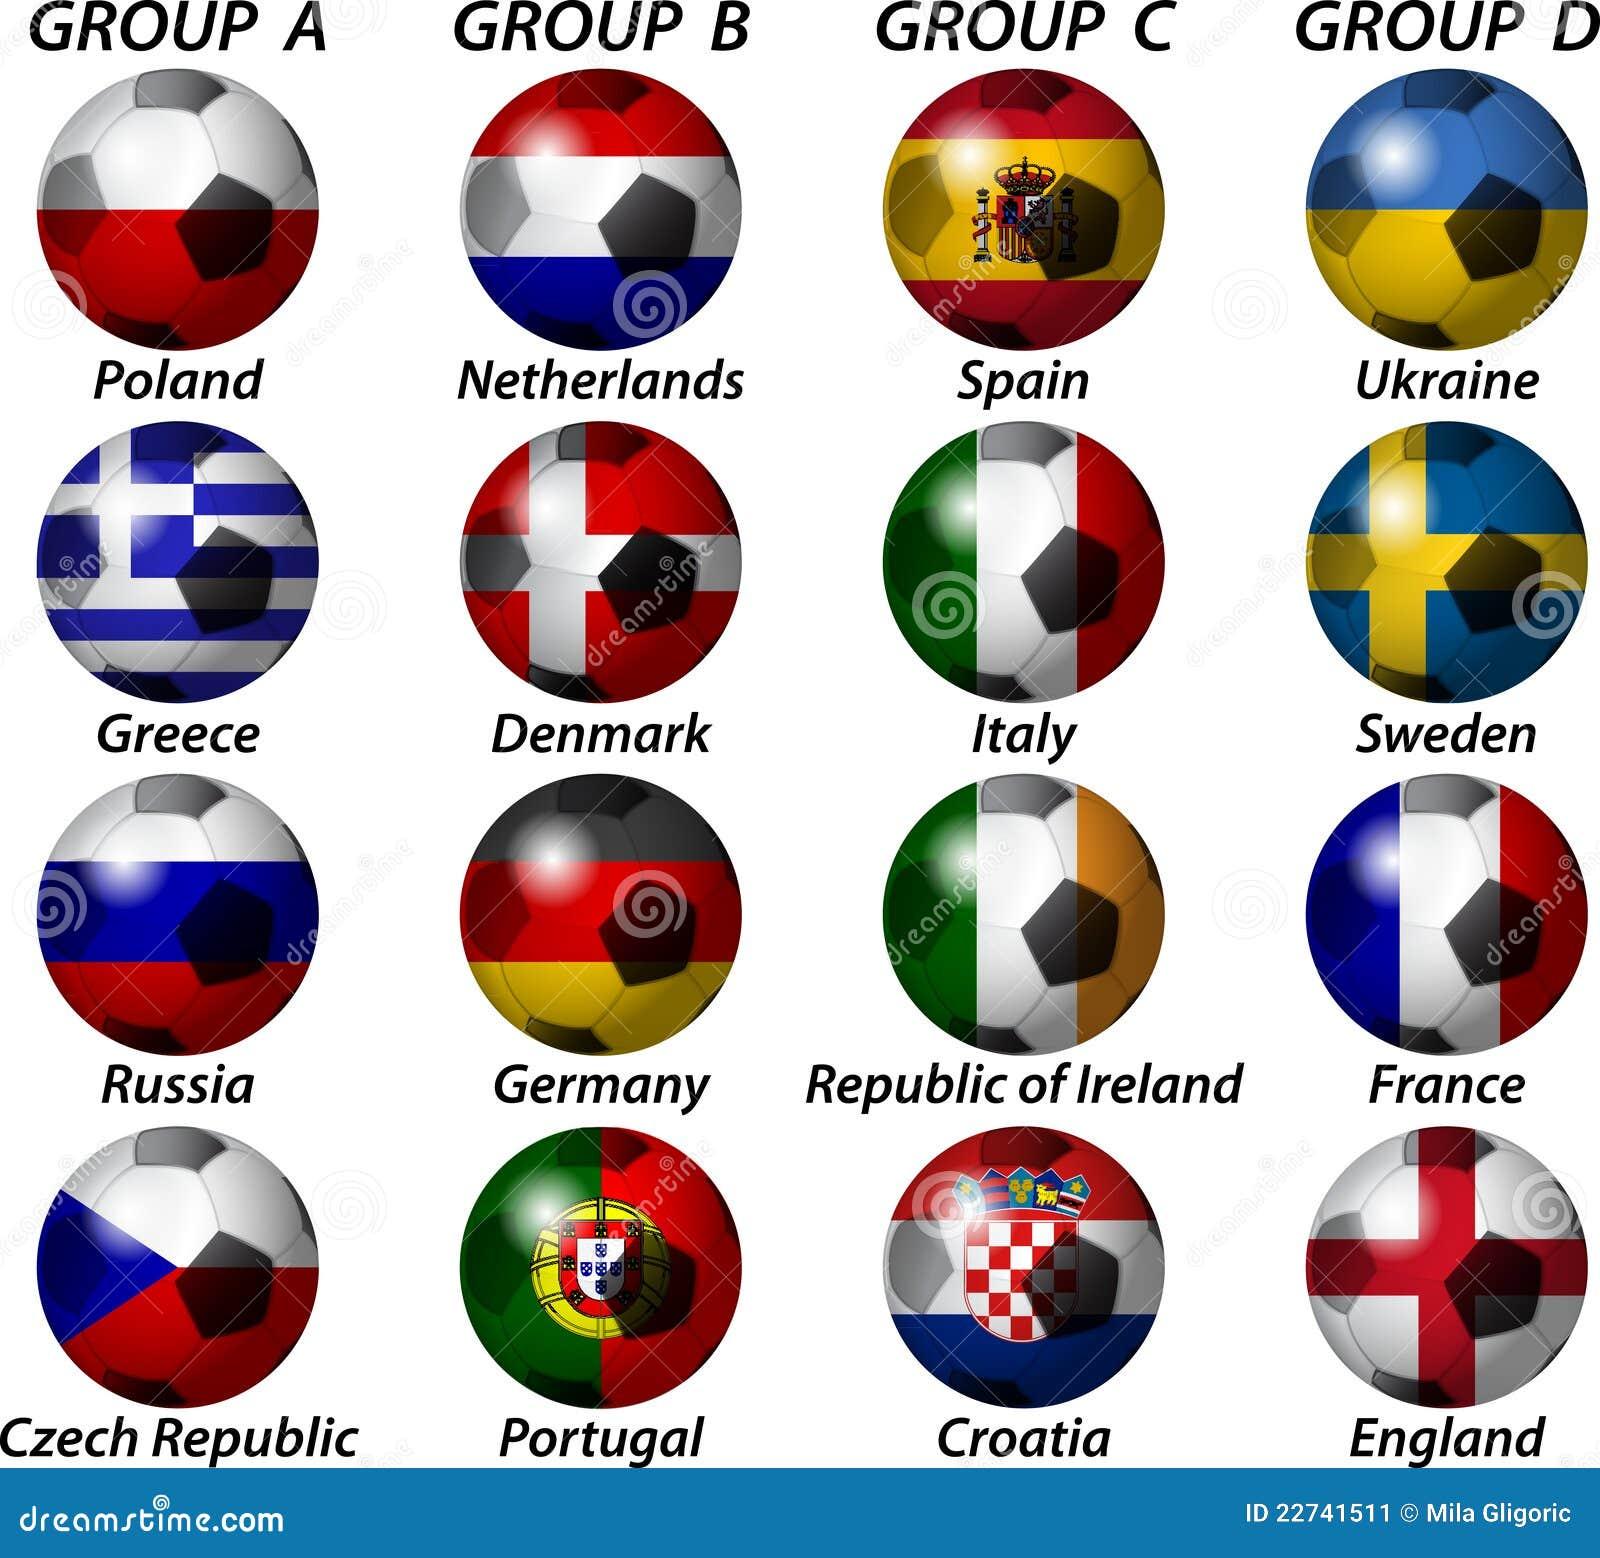 Uefa группы евро 2012